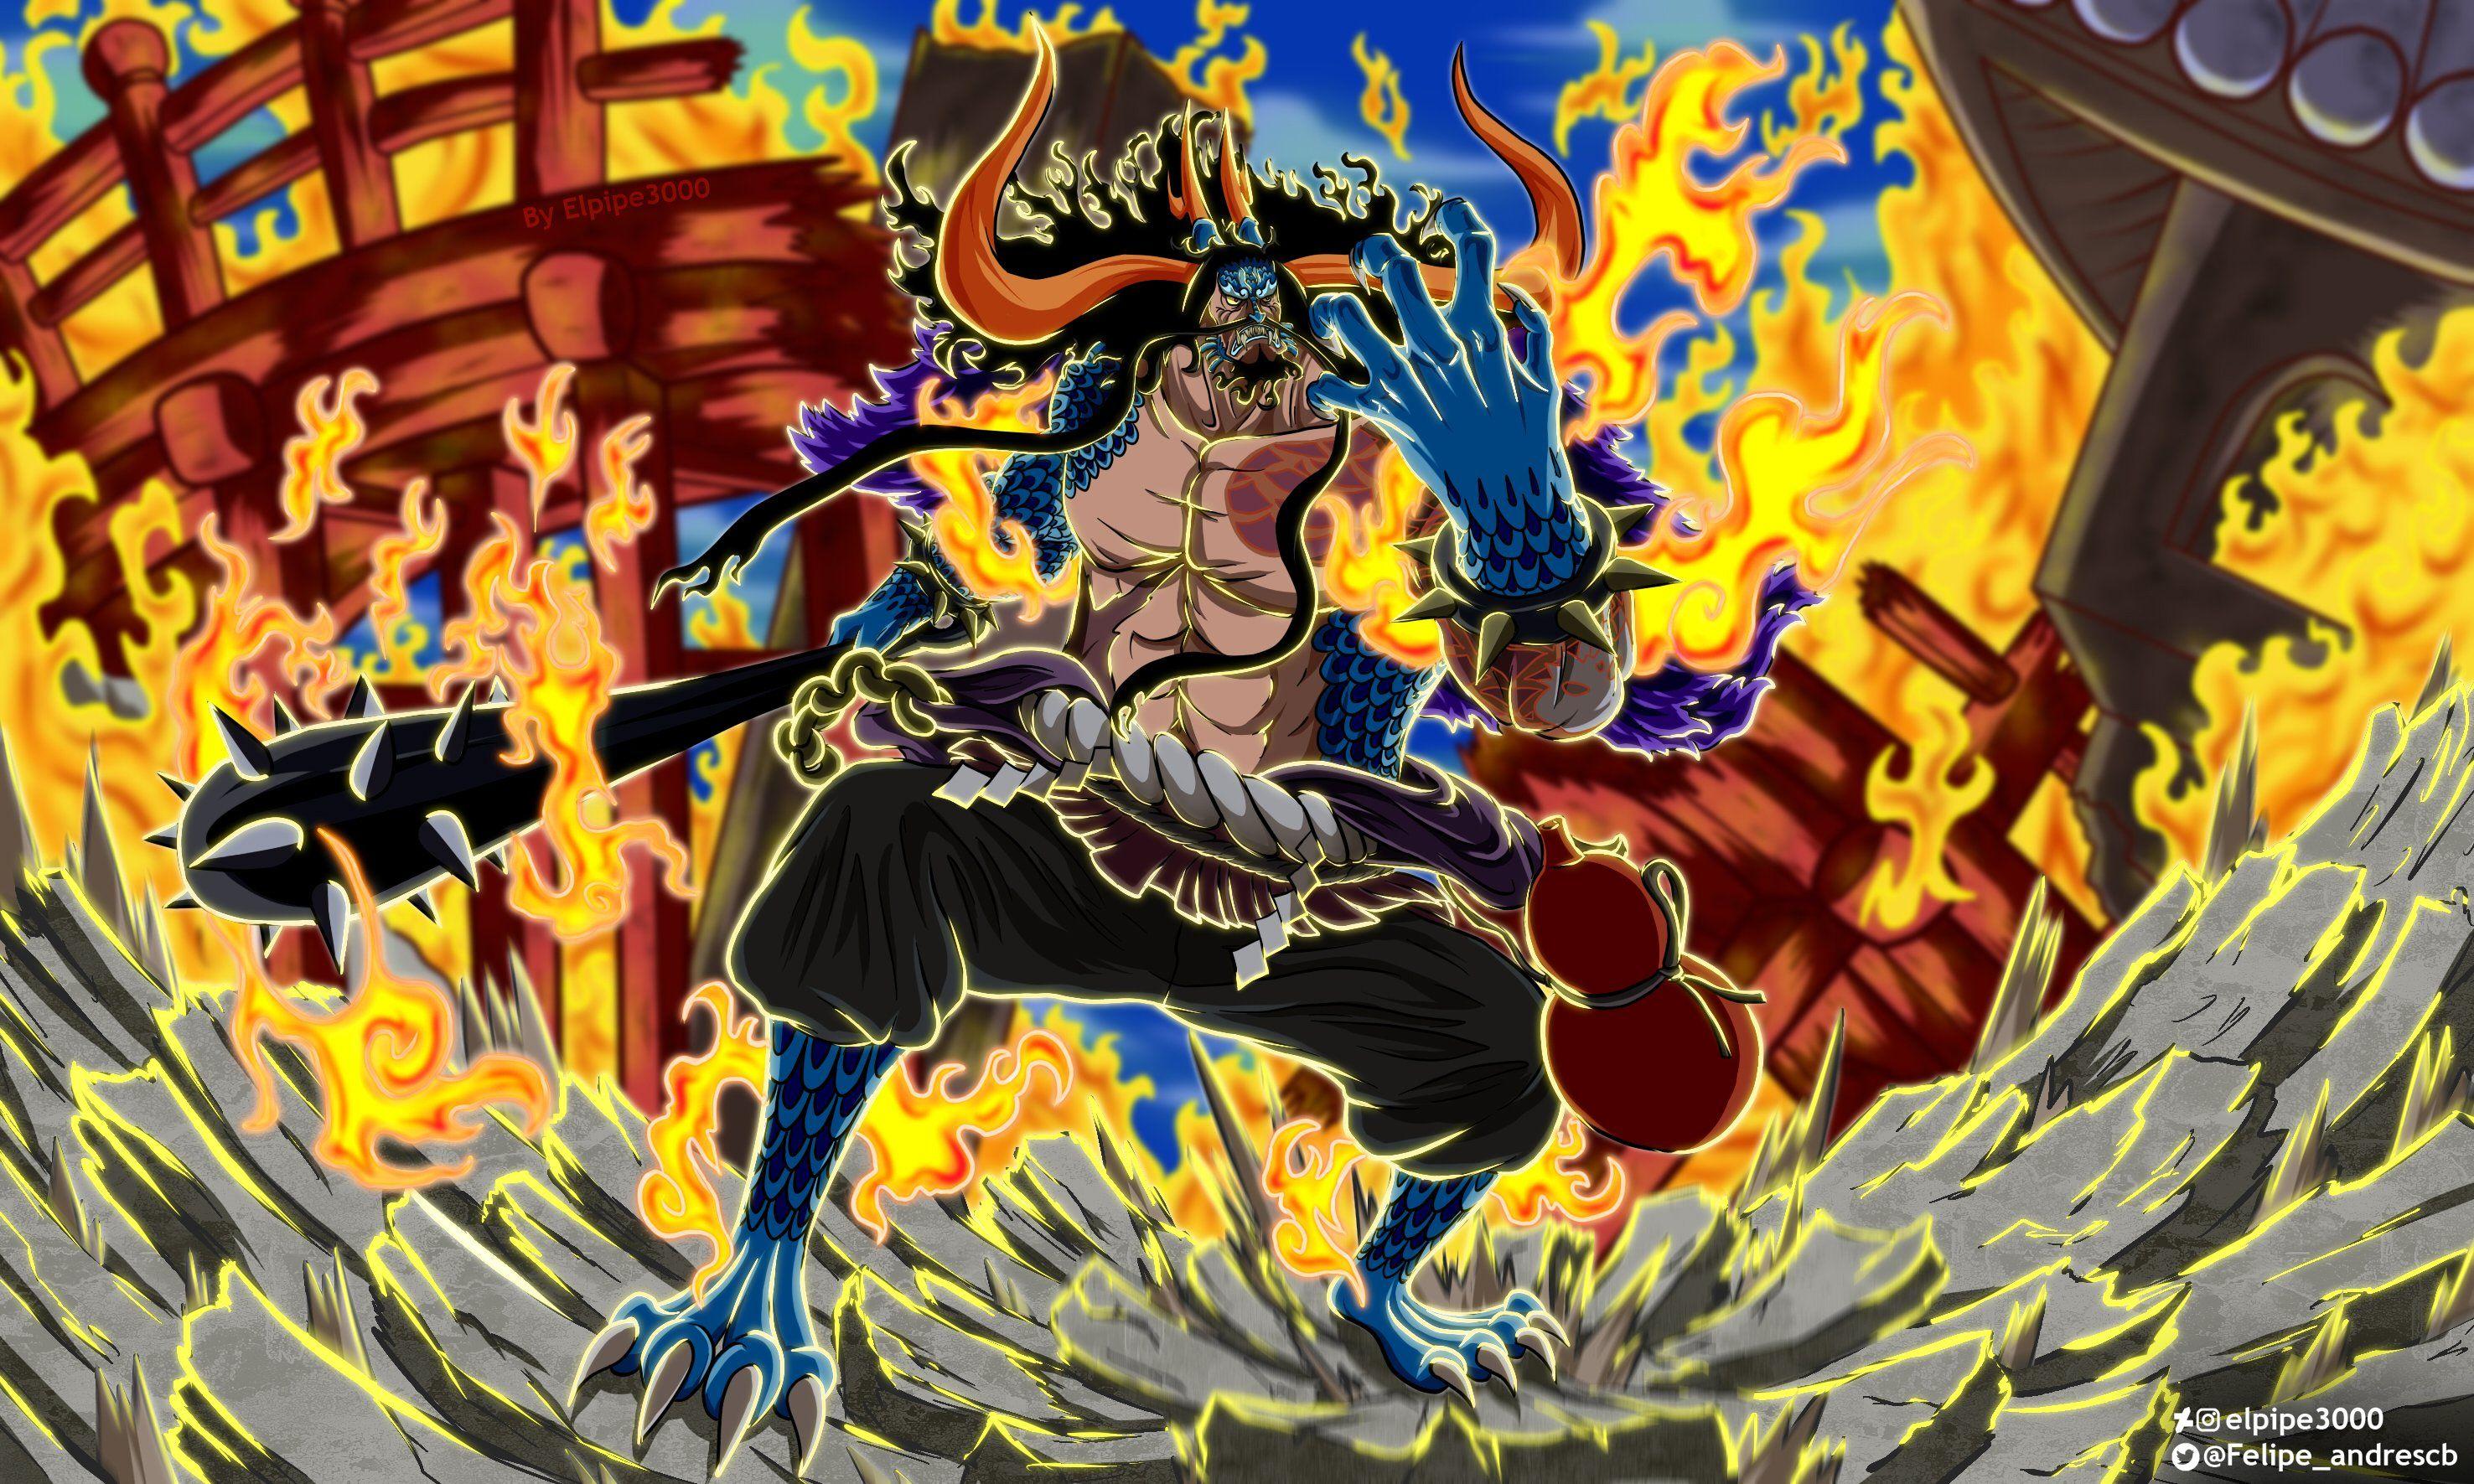 Mode Hybrid Kaido One Piece. Sumber: id.pinterest.com